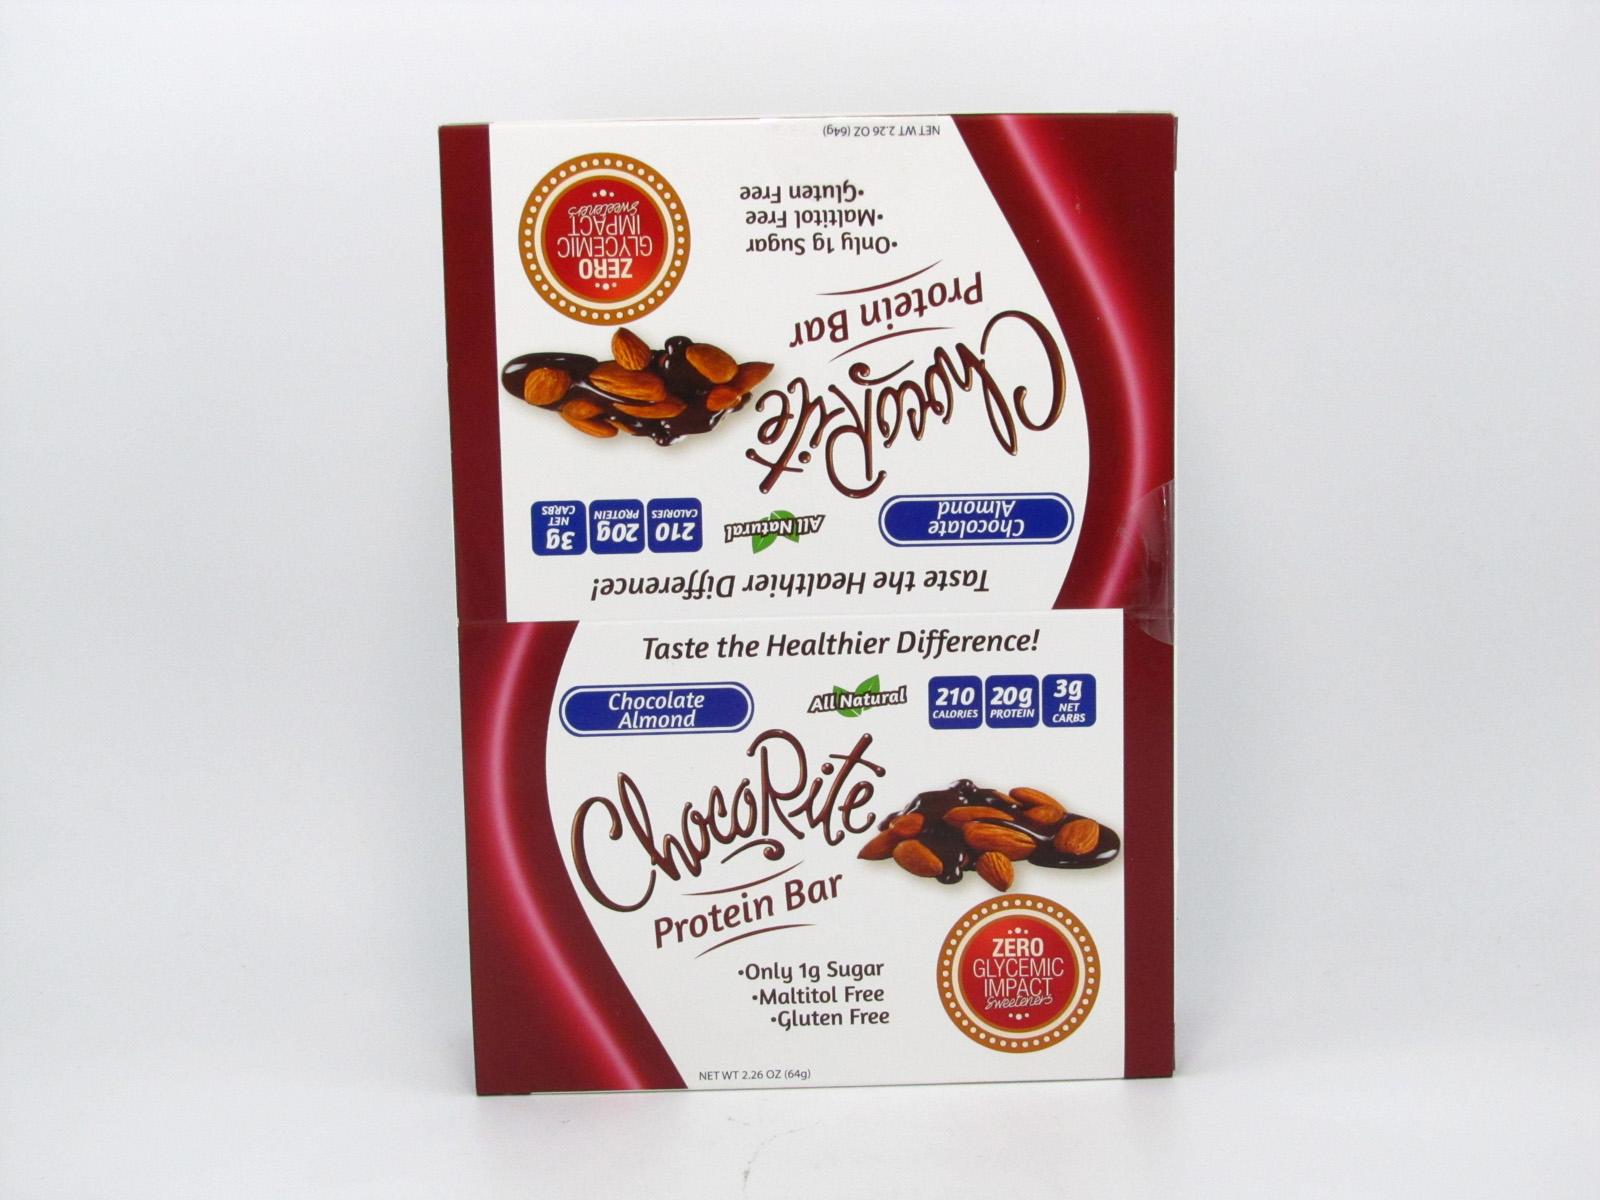 Chocorite Protein Bar ( 64g) - Chocolate Almond Box of 12 - front view